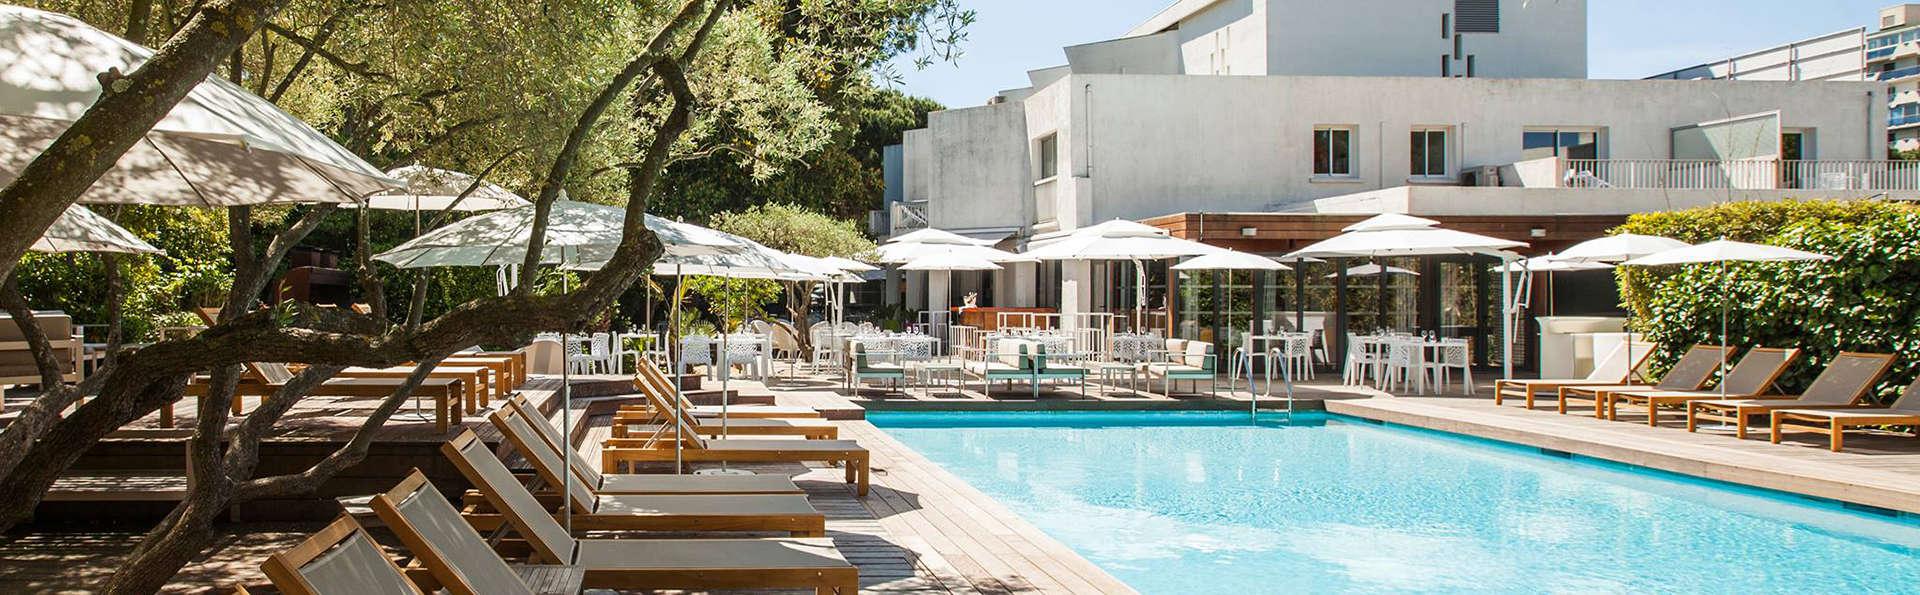 Le Prose Hotel - Edit_Pool2.jpg